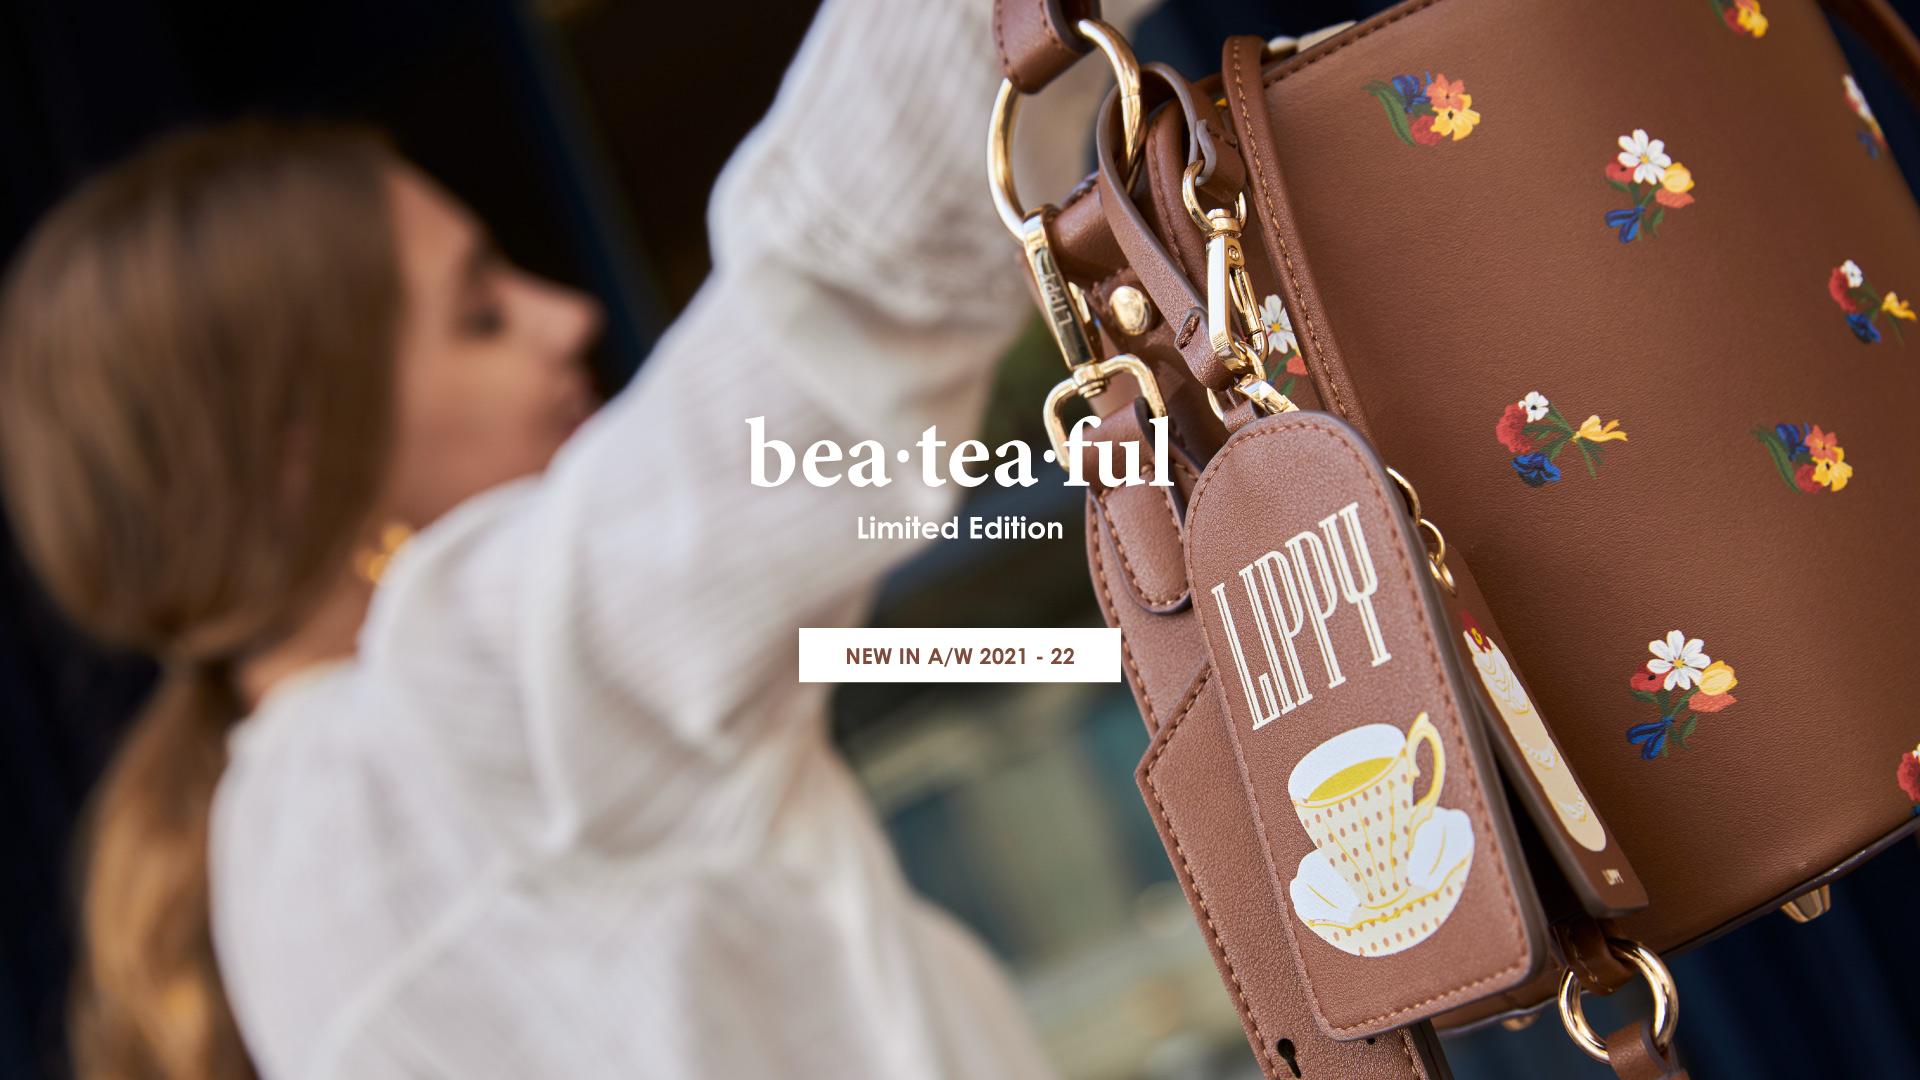 1025|beau·tea·ful (Brigitte_C)